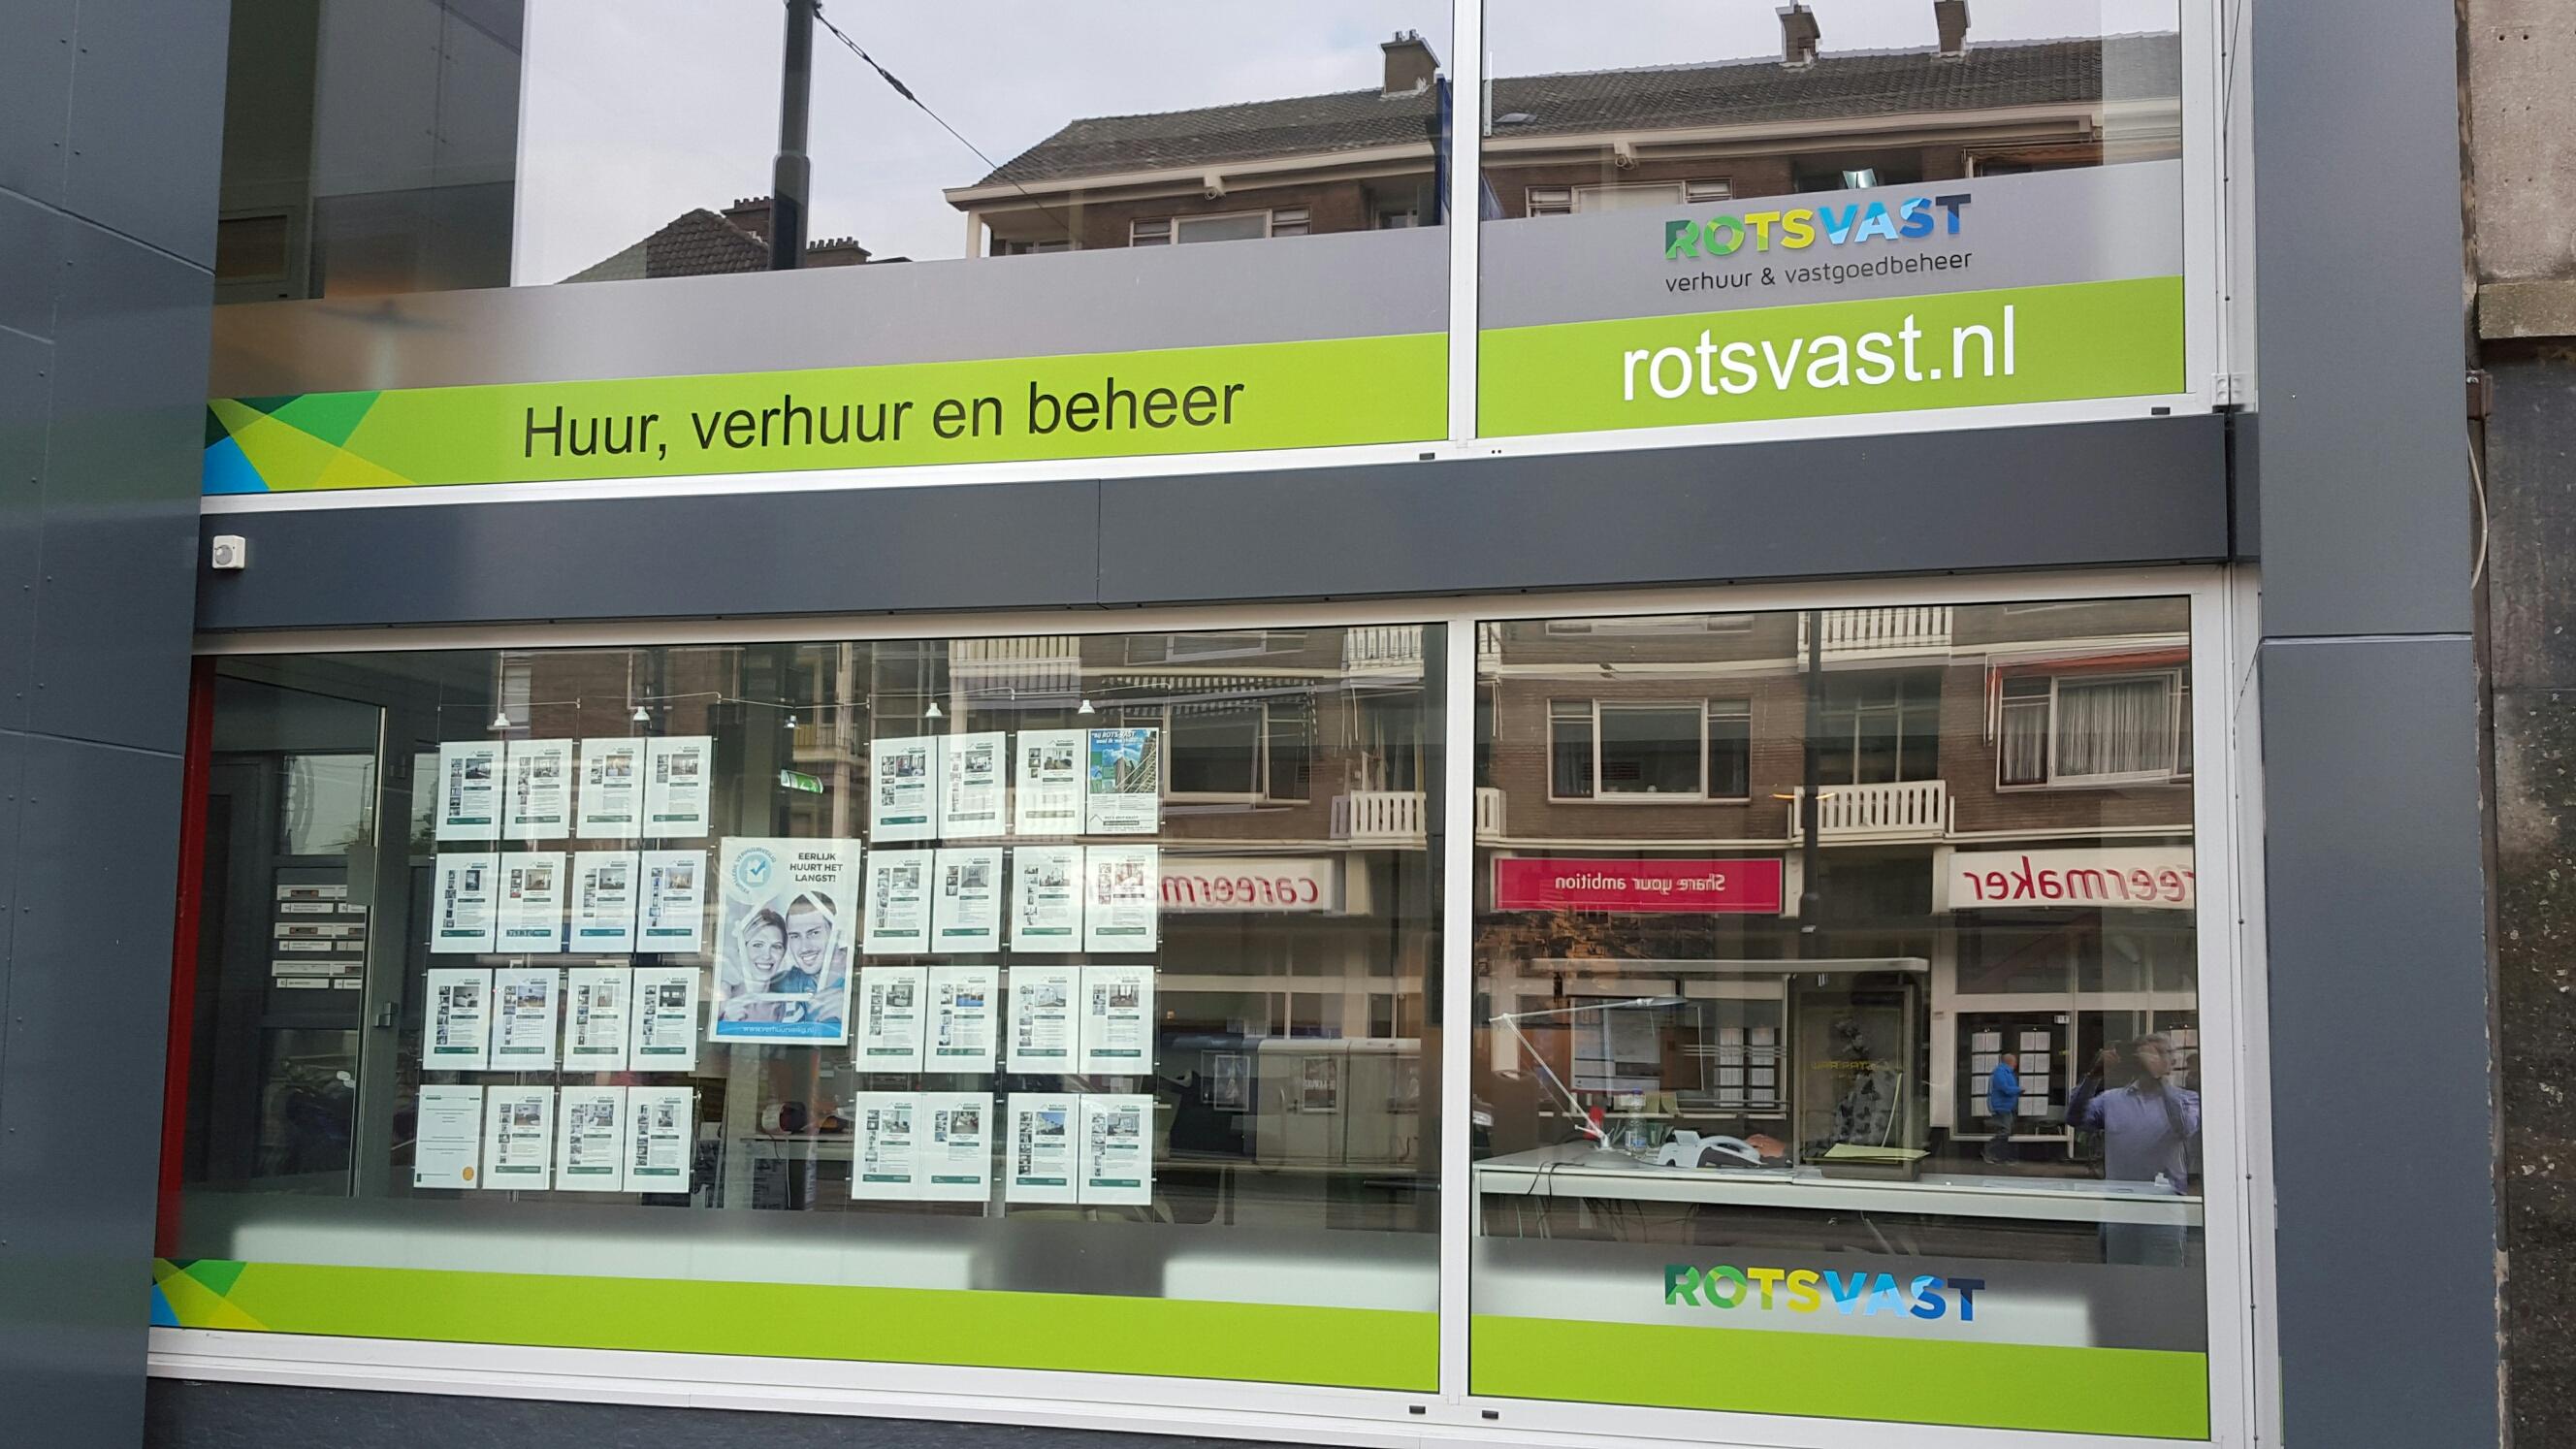 Rotsvast makelaardij - vestiging Rotterdam